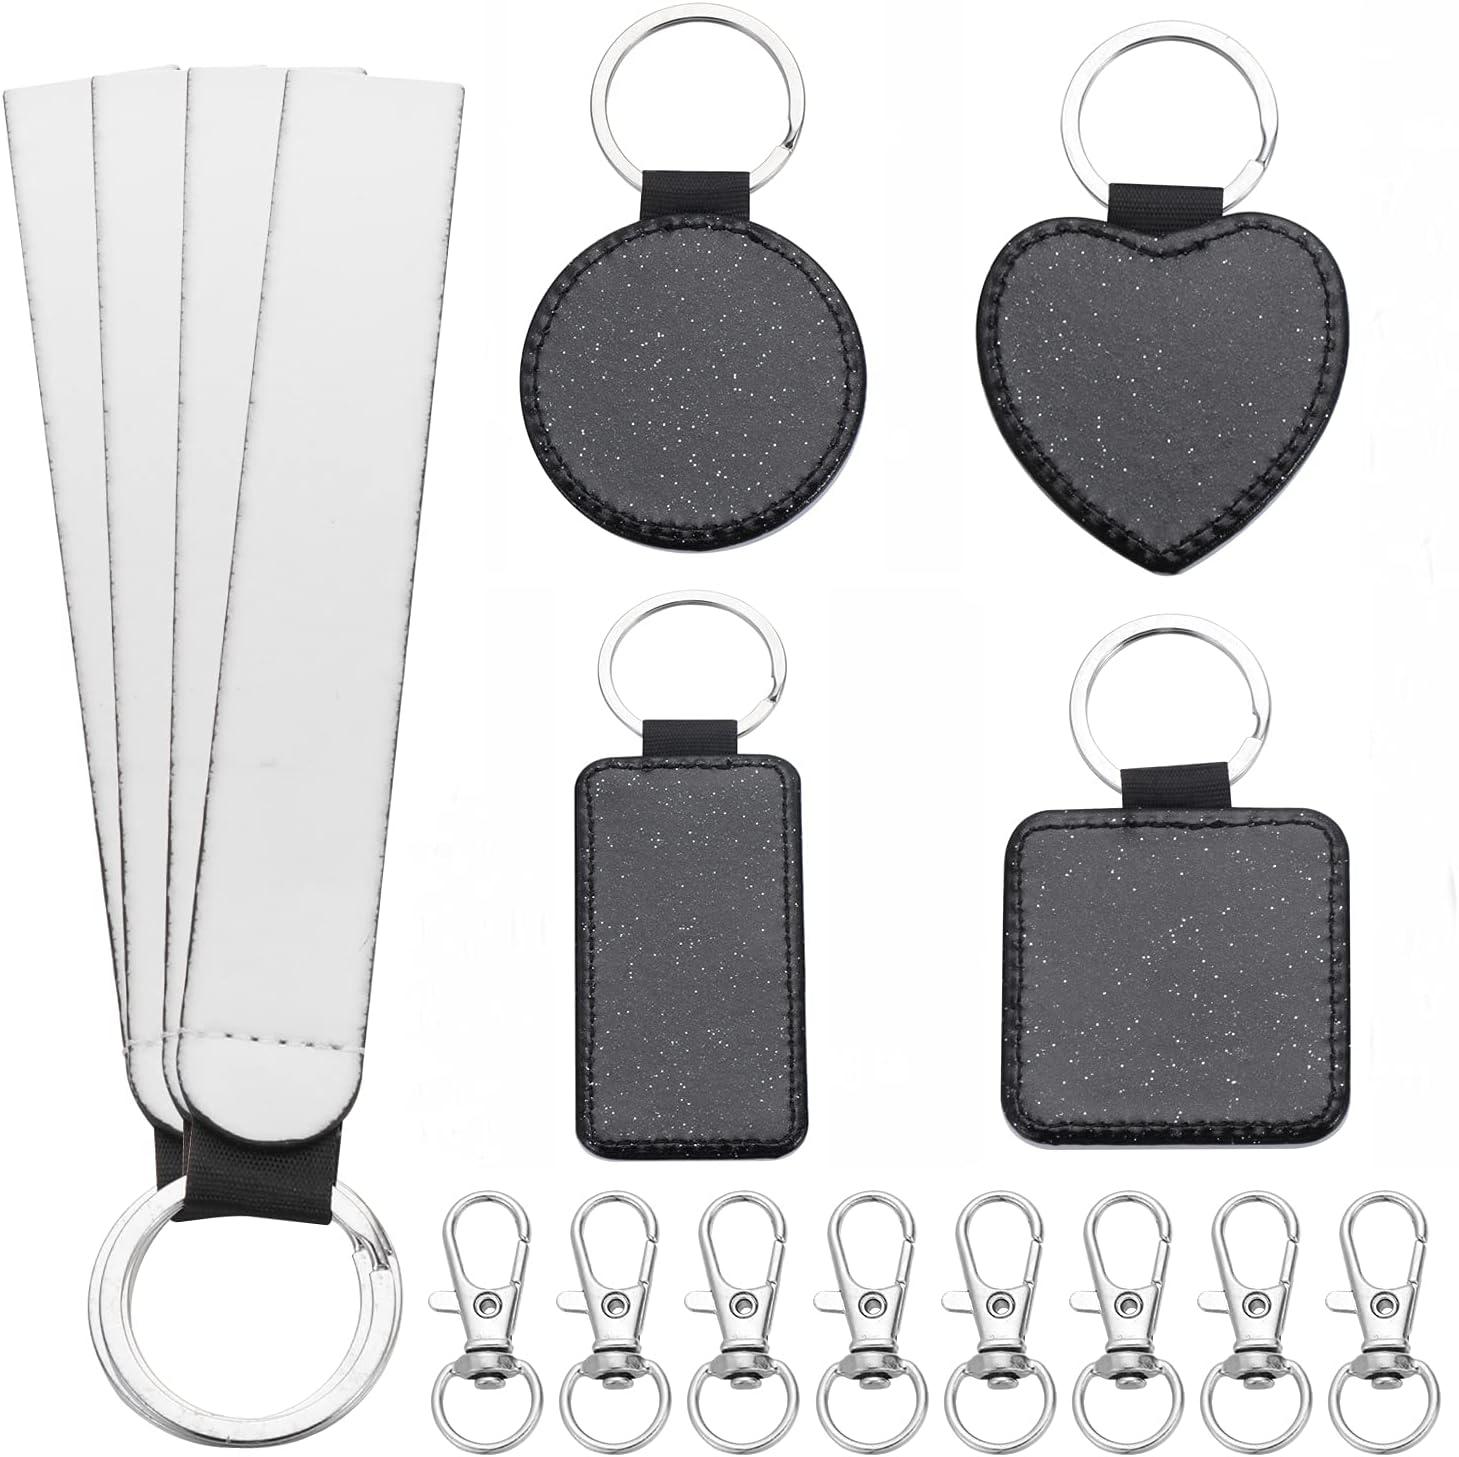 16PCS Sublimation Blanks Keychains Kits, Blank PU Leather Keyrings Set with Wristlet Lanyard & Swivel Snap Hooks, Square Sublimation Heat Transfer Blank Keychains for DIY Tags (Black)